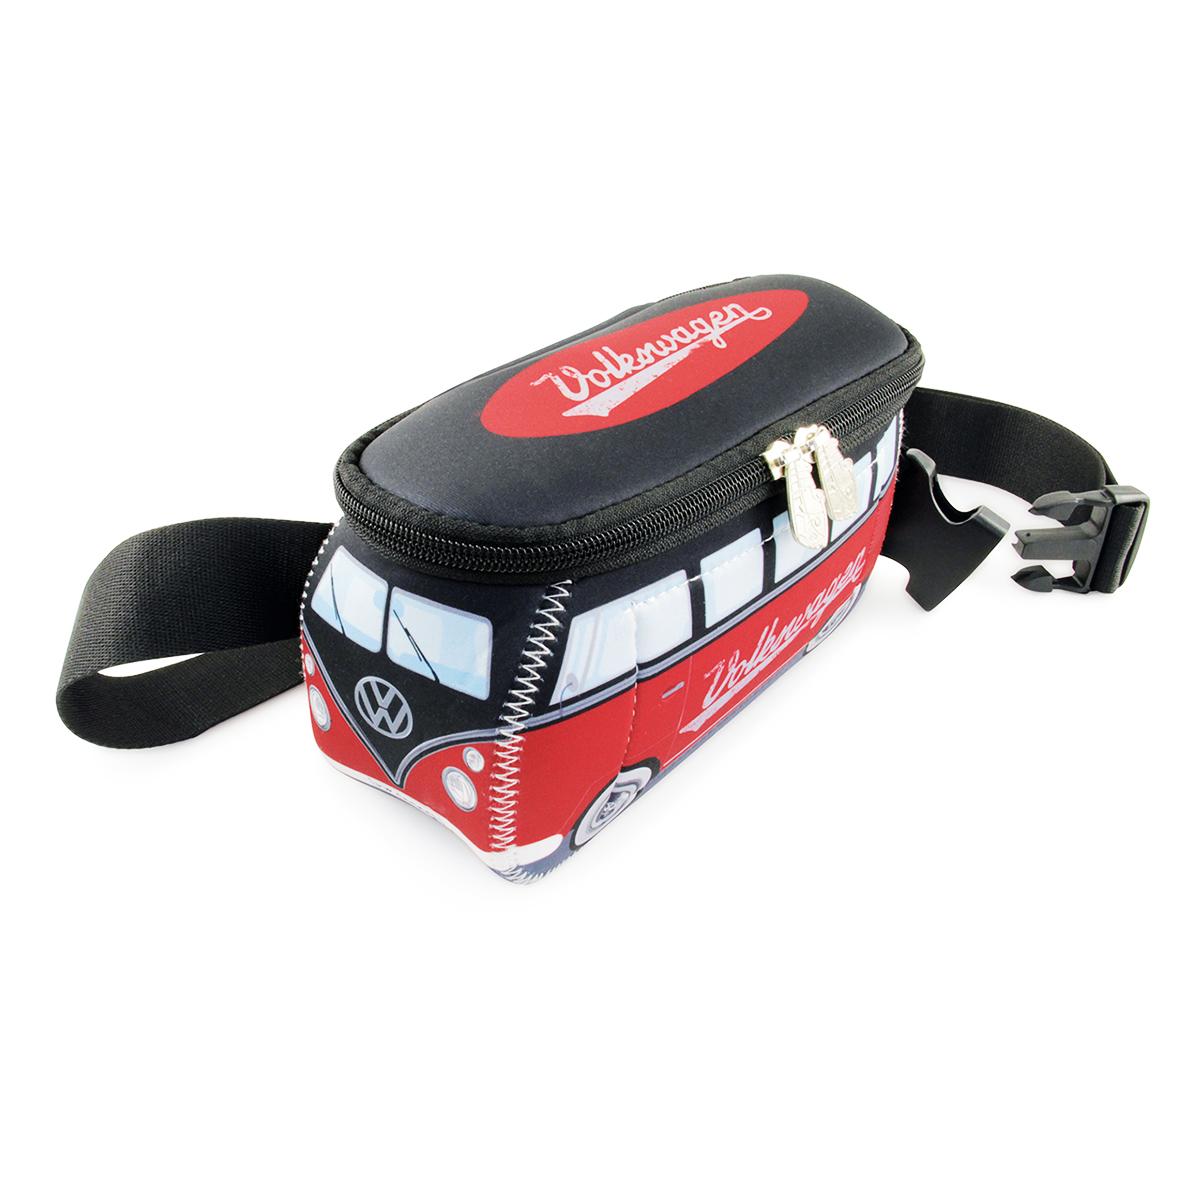 Pochette ceinture \'Volkswagen\' rouge noir - 25x11 cm - [Q1971]